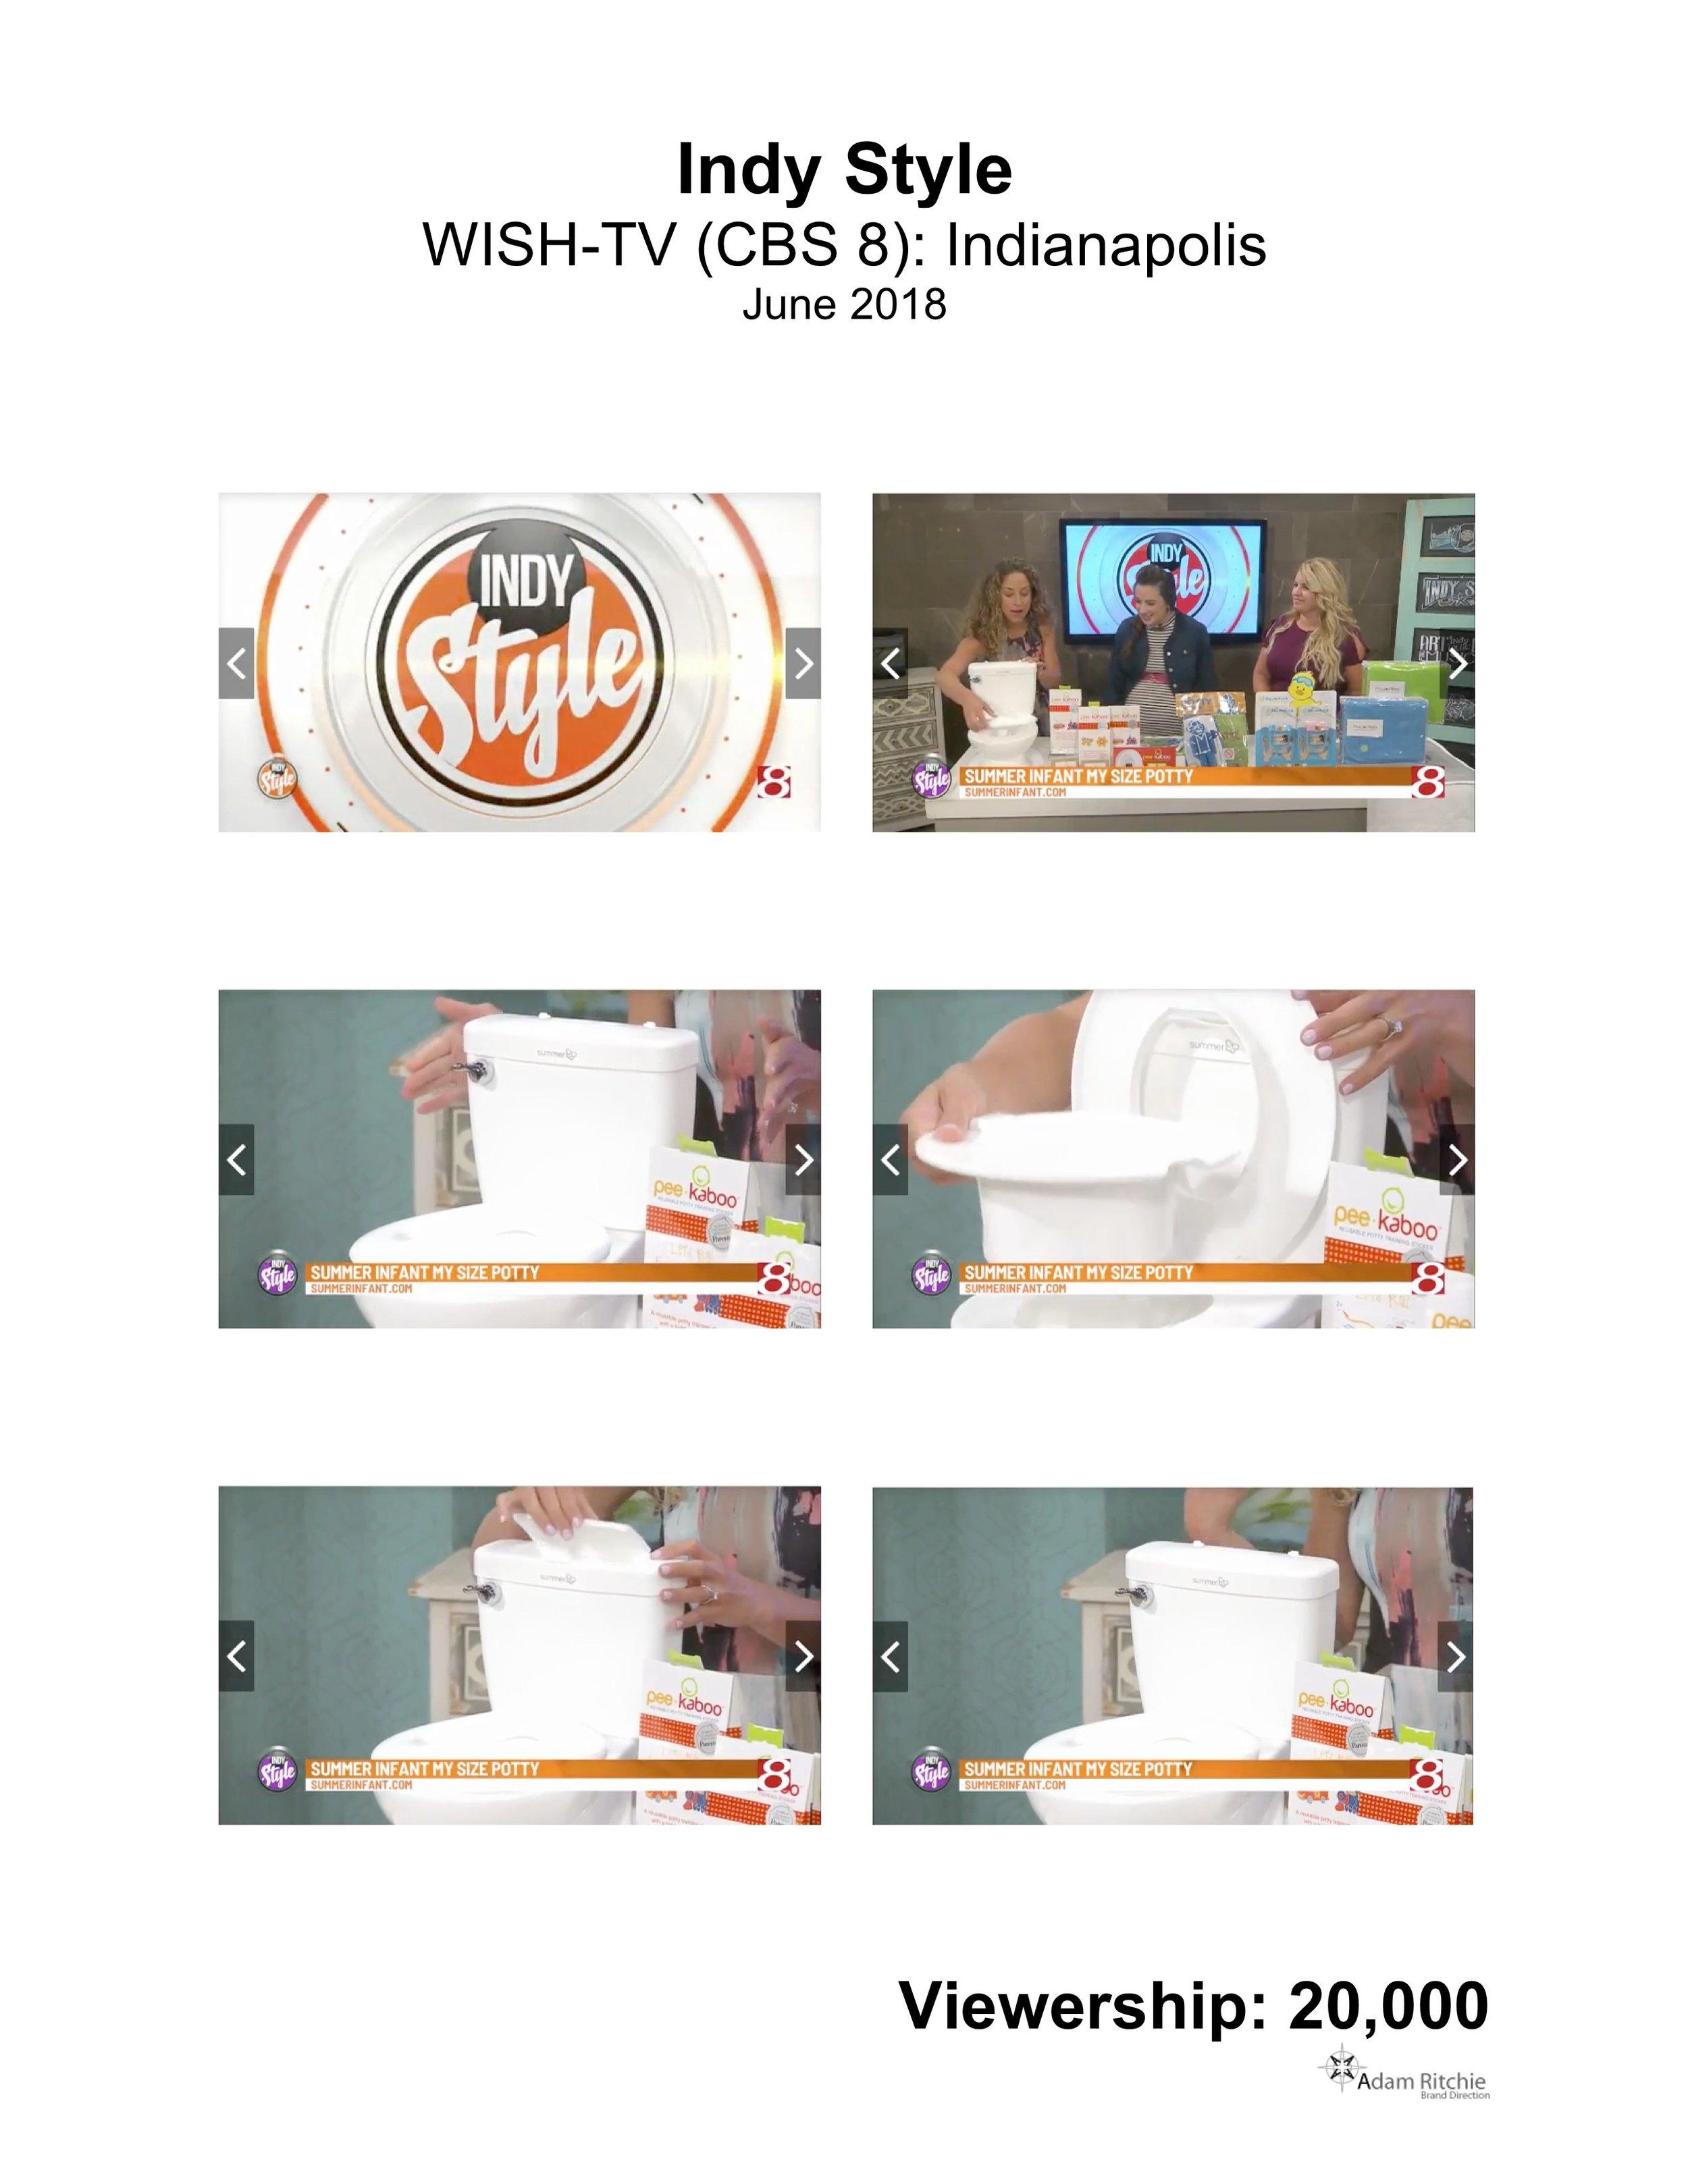 2018.06.28_WISH-TV (CBS 8)_Indy Style_Summer Infant My Size Potty.jpeg